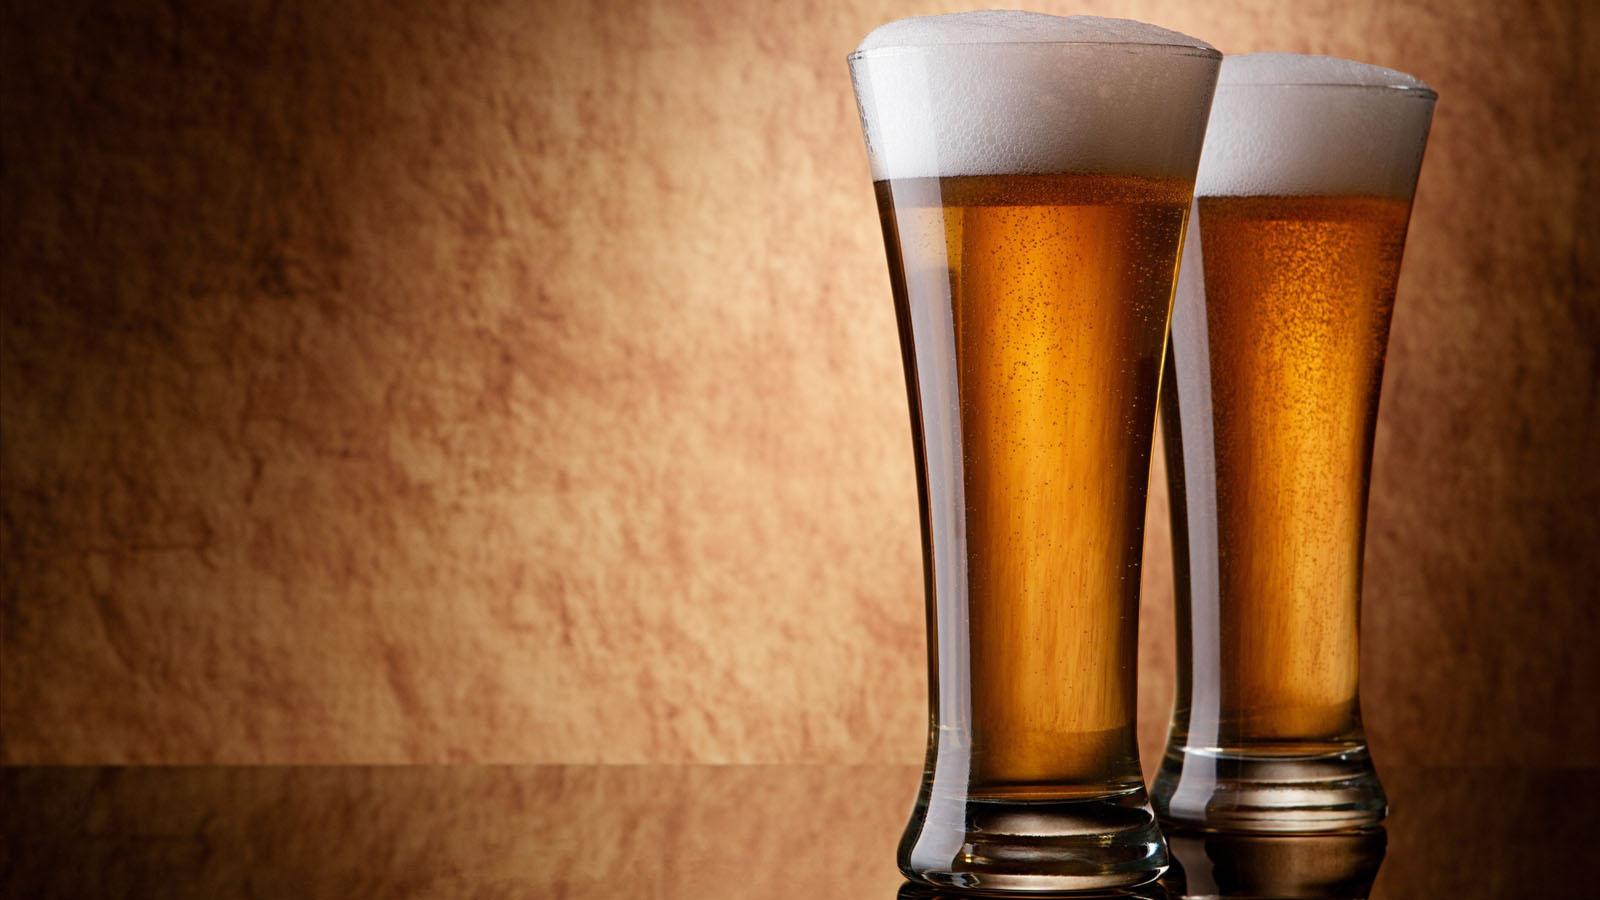 beer-on-glass-hd-desktop-wallpaper